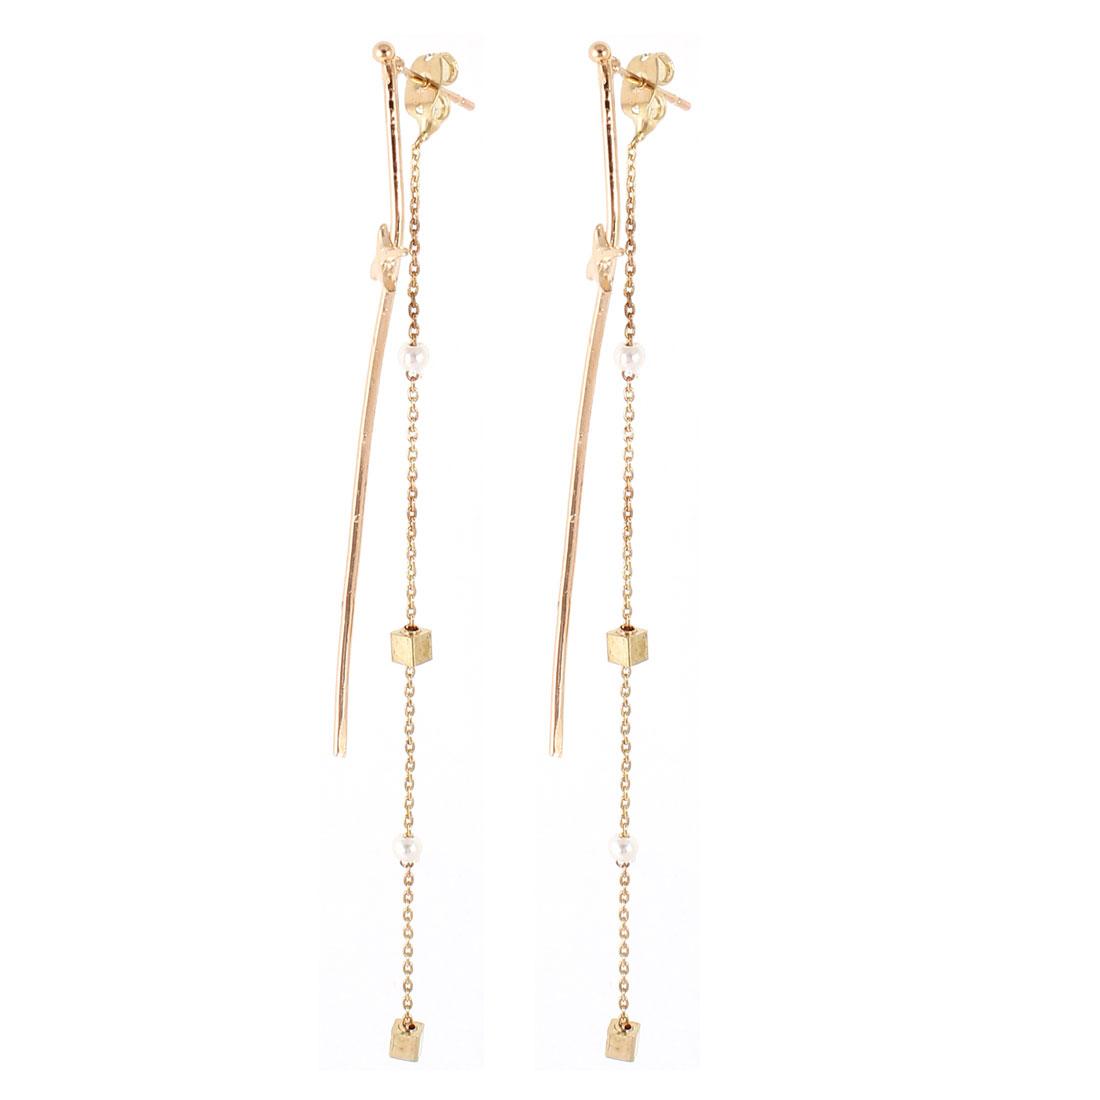 Woman Gold Tone Round Beads Ornament Ear Stud Earrings Eardrop Pair